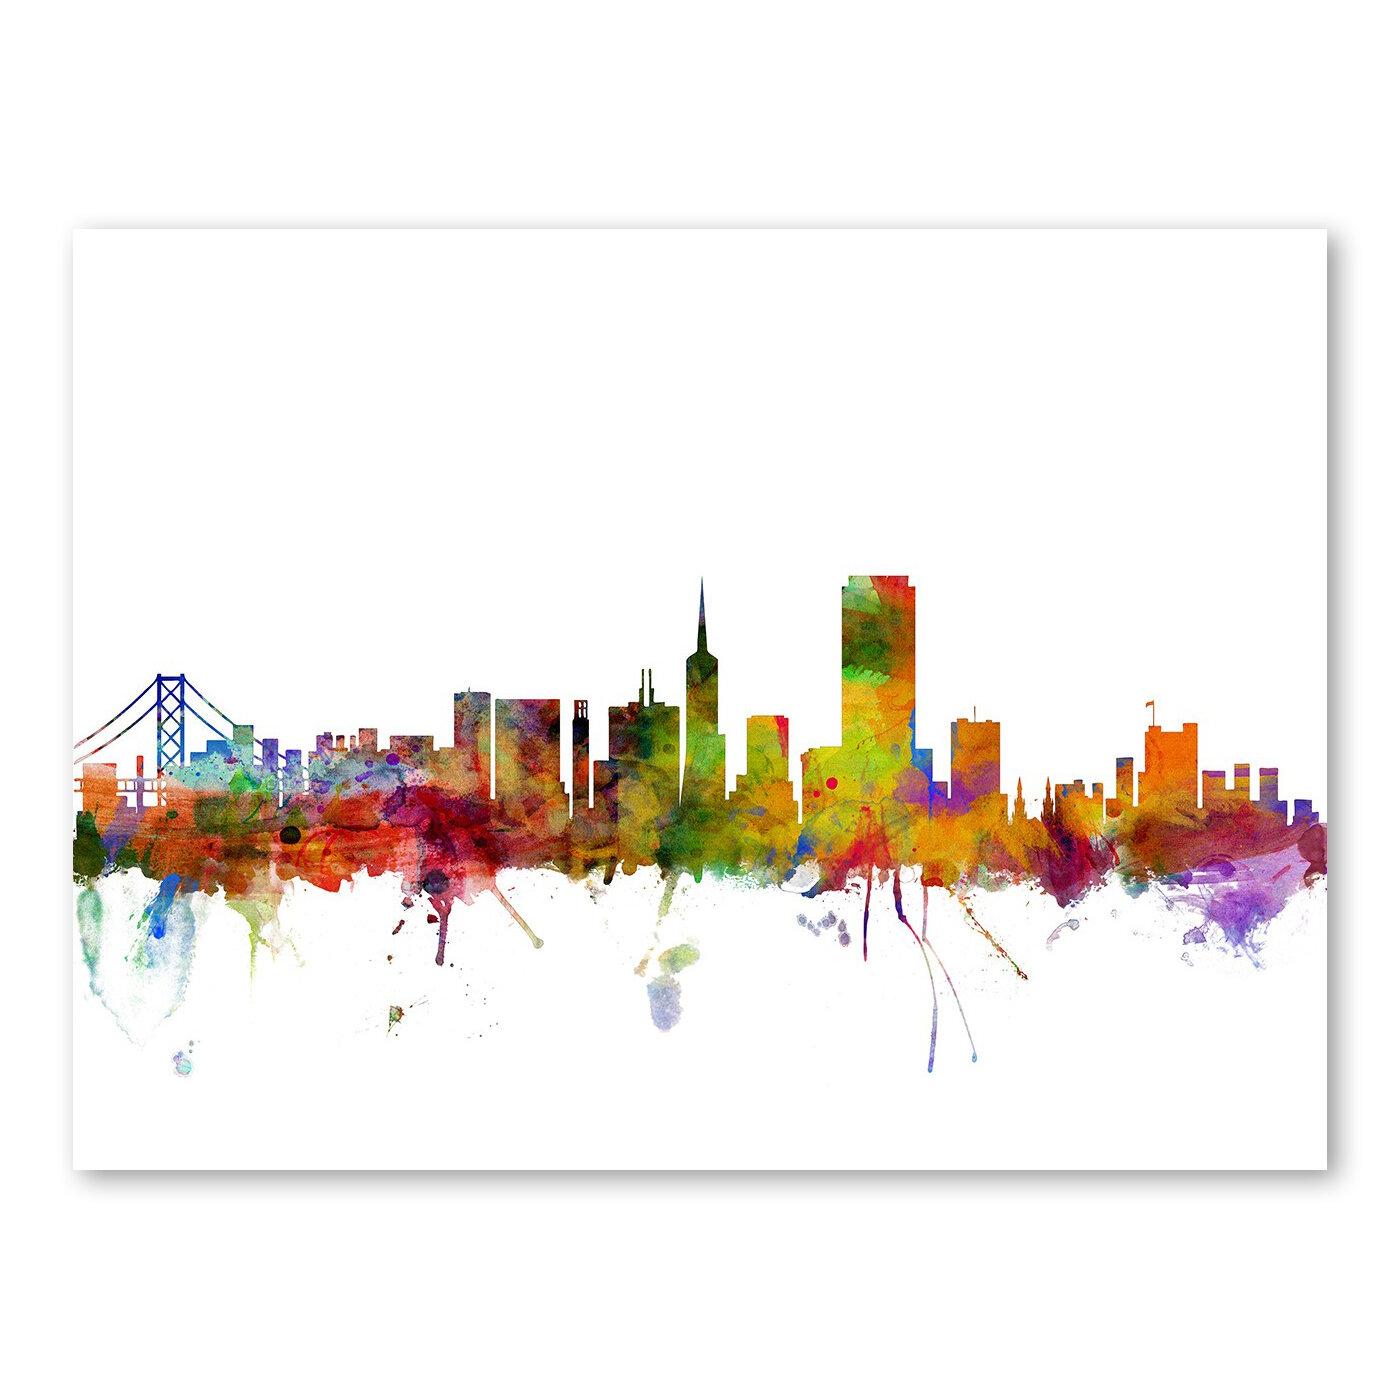 Americanflat san francisco city skyline wall mural wayfair for City skyline wall mural